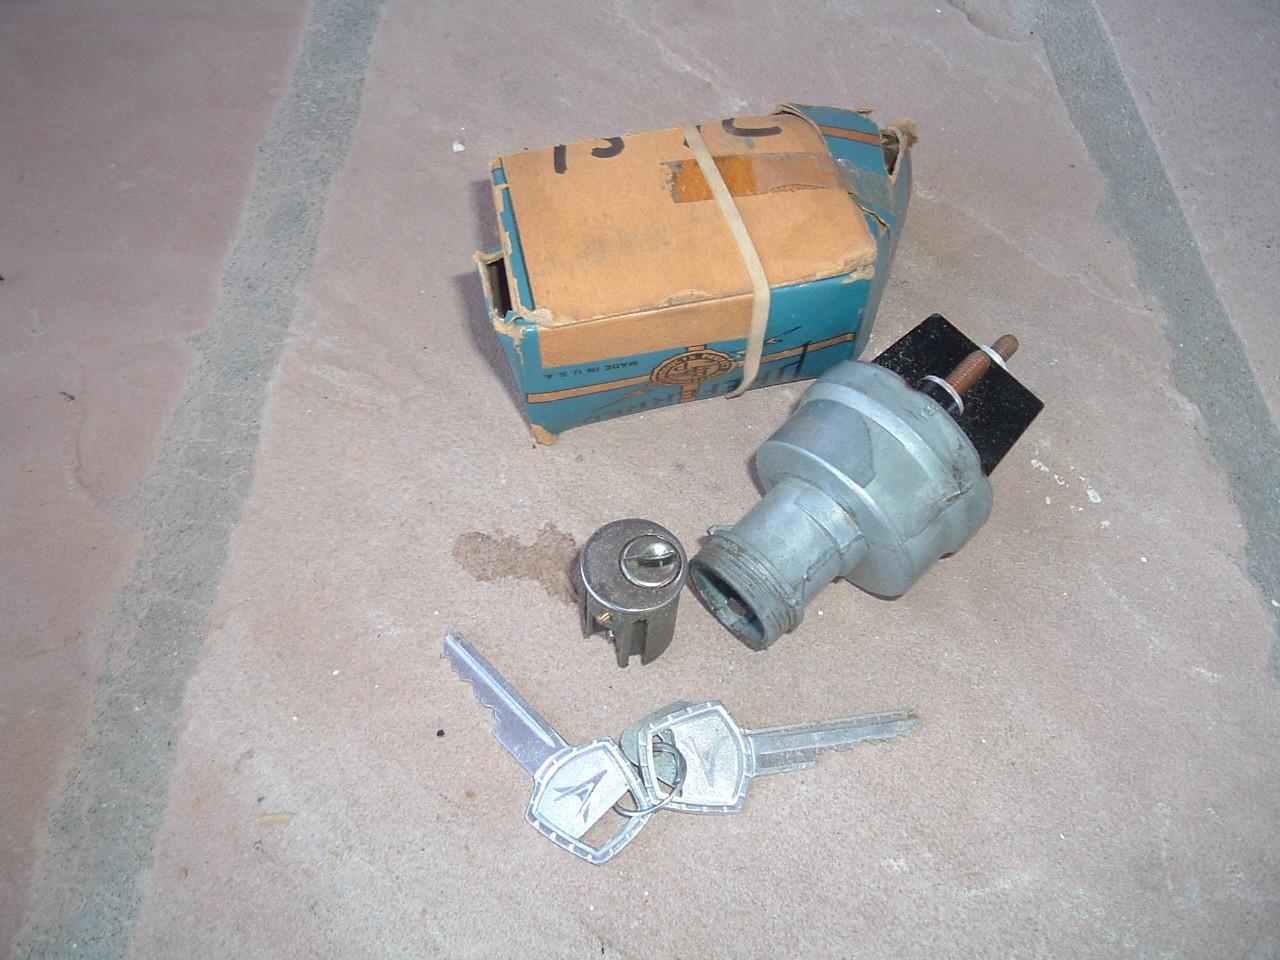 1958 1959 Chrysler Dodge Plymouth Desoto ignition switch w/ keys 1838984 (z 1838984a)